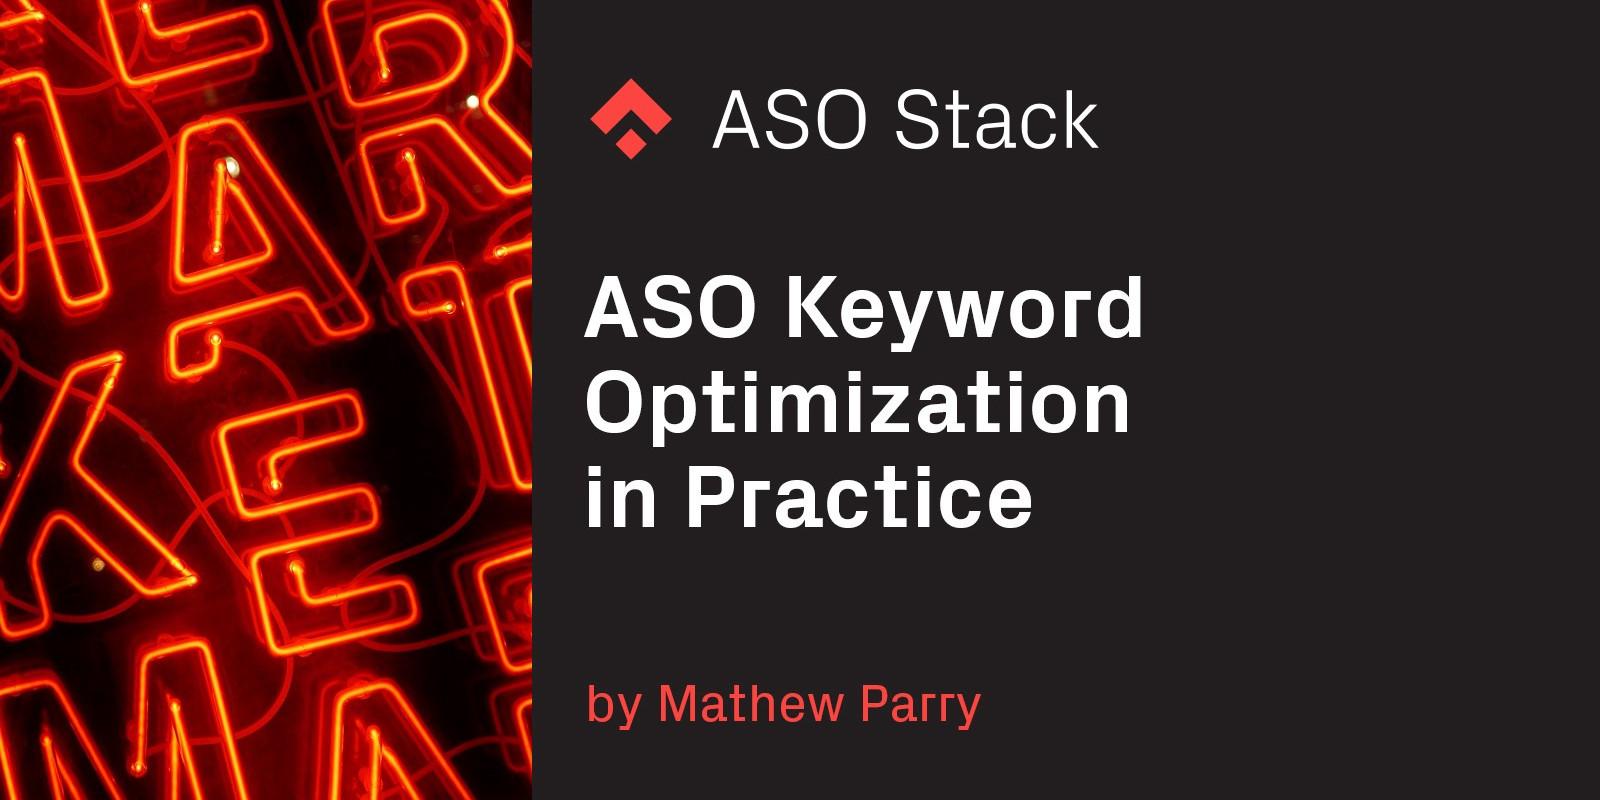 ASO Keyword Optimization in Practice: Part 2